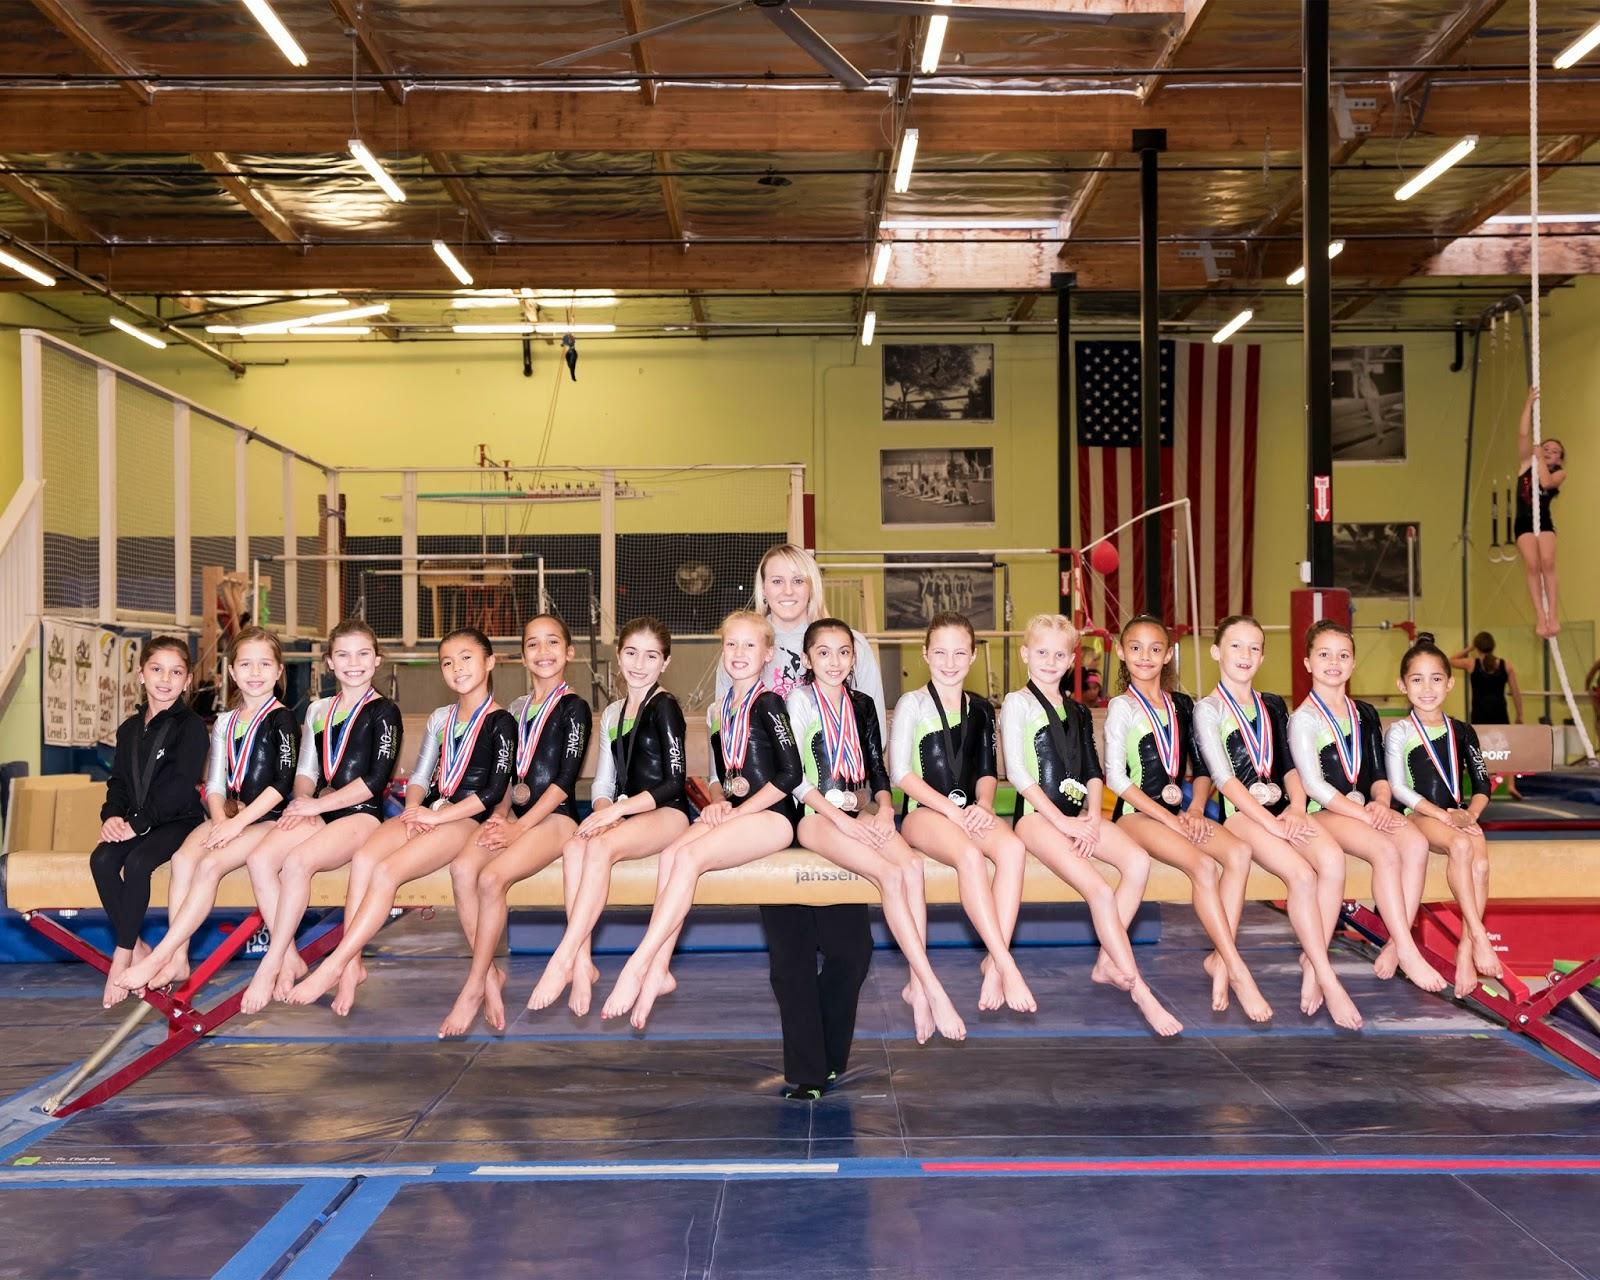 level 3 state gymnastics meet 2014 missouri